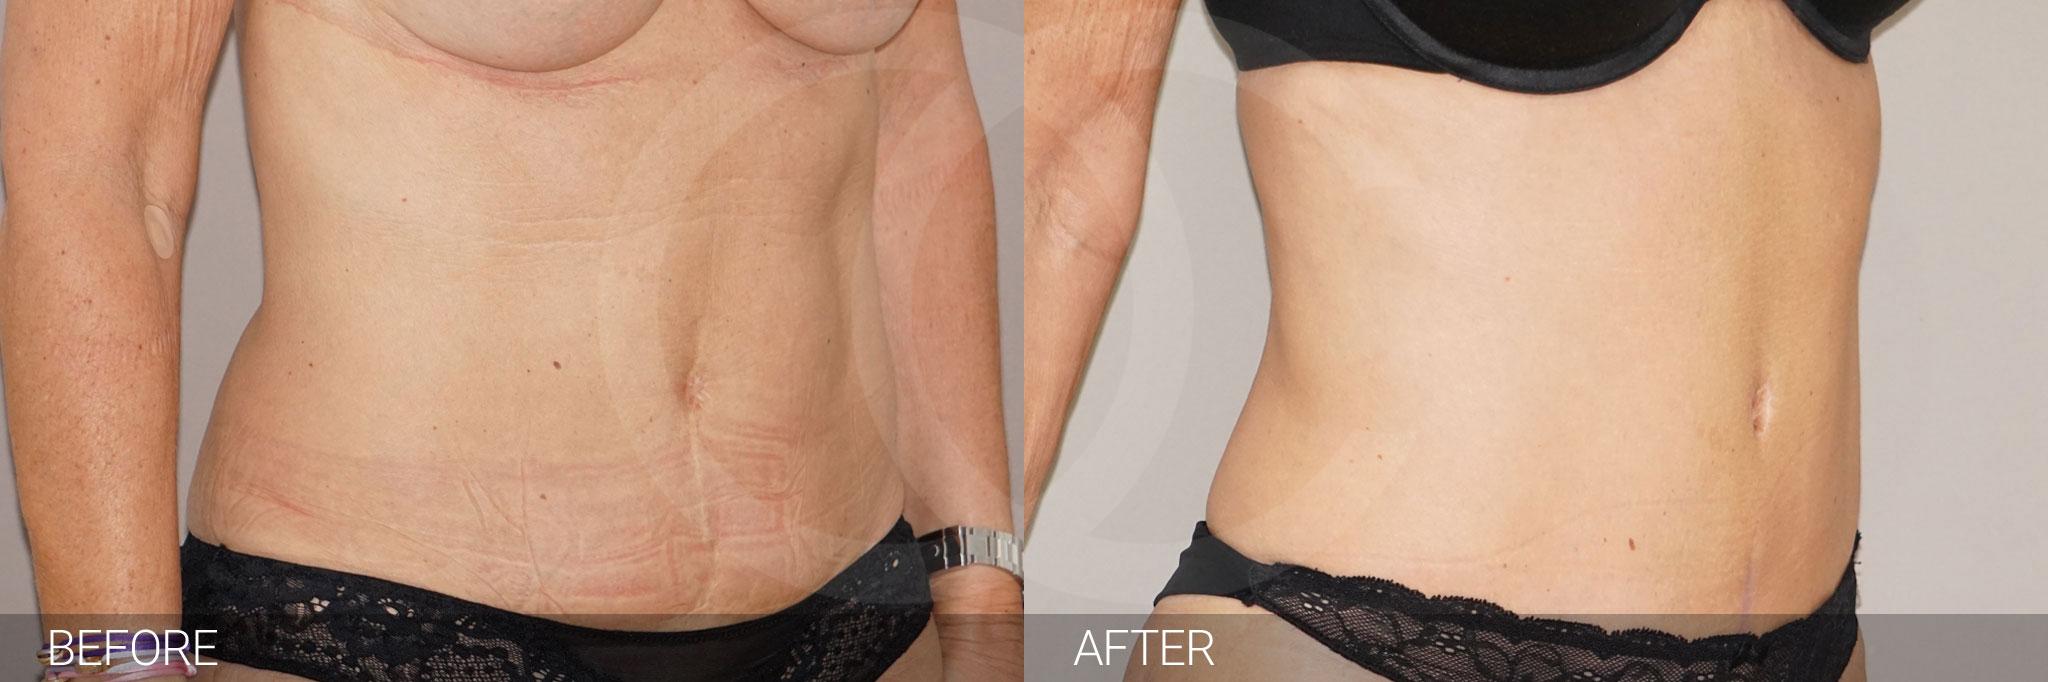 Abdominoplastia reducir de abdomen ante/post-op II